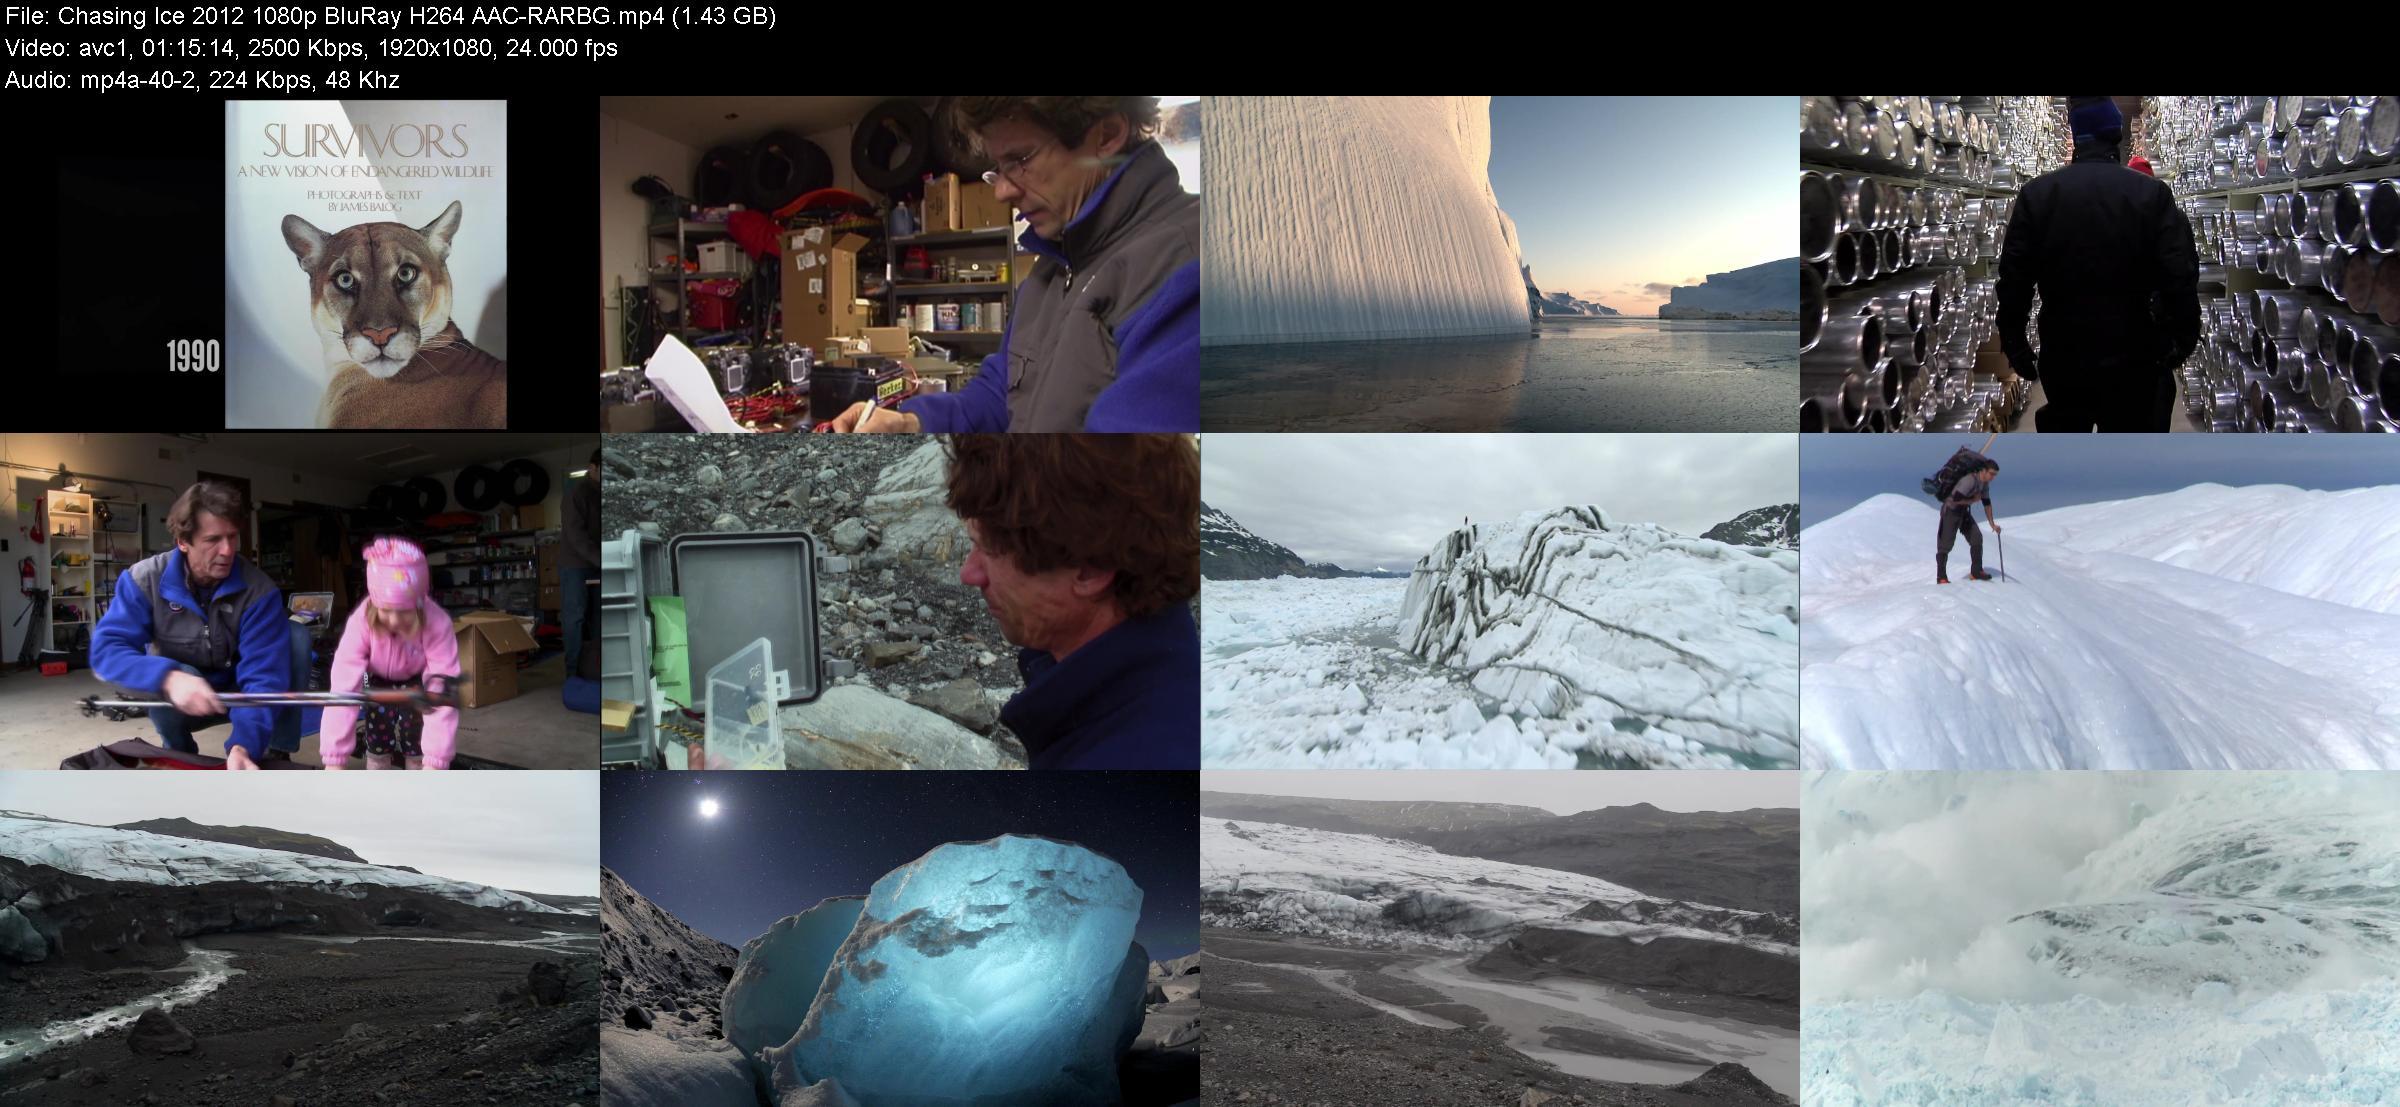 Chasing Ice 2012 1080p BluRay H264 AAC-RARBG